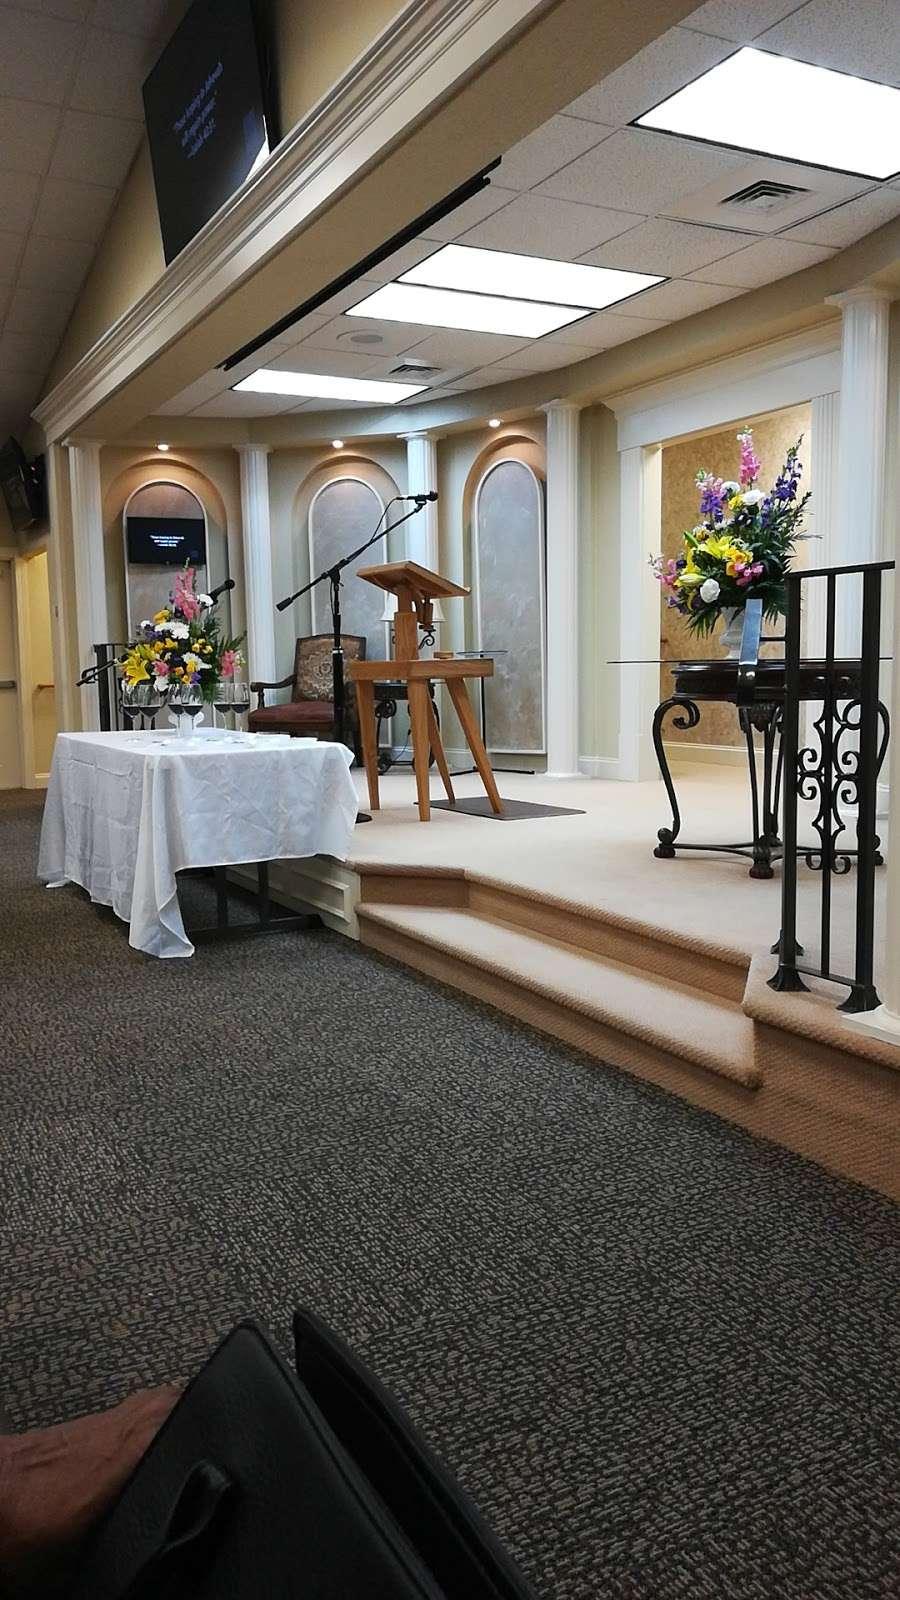 Kingdom Hall of Jehovahs Witnesses - church    Photo 1 of 9   Address: 6200 Wilgrove Mint Hill Rd, Mint Hill, NC 28227, USA   Phone: (704) 573-2909